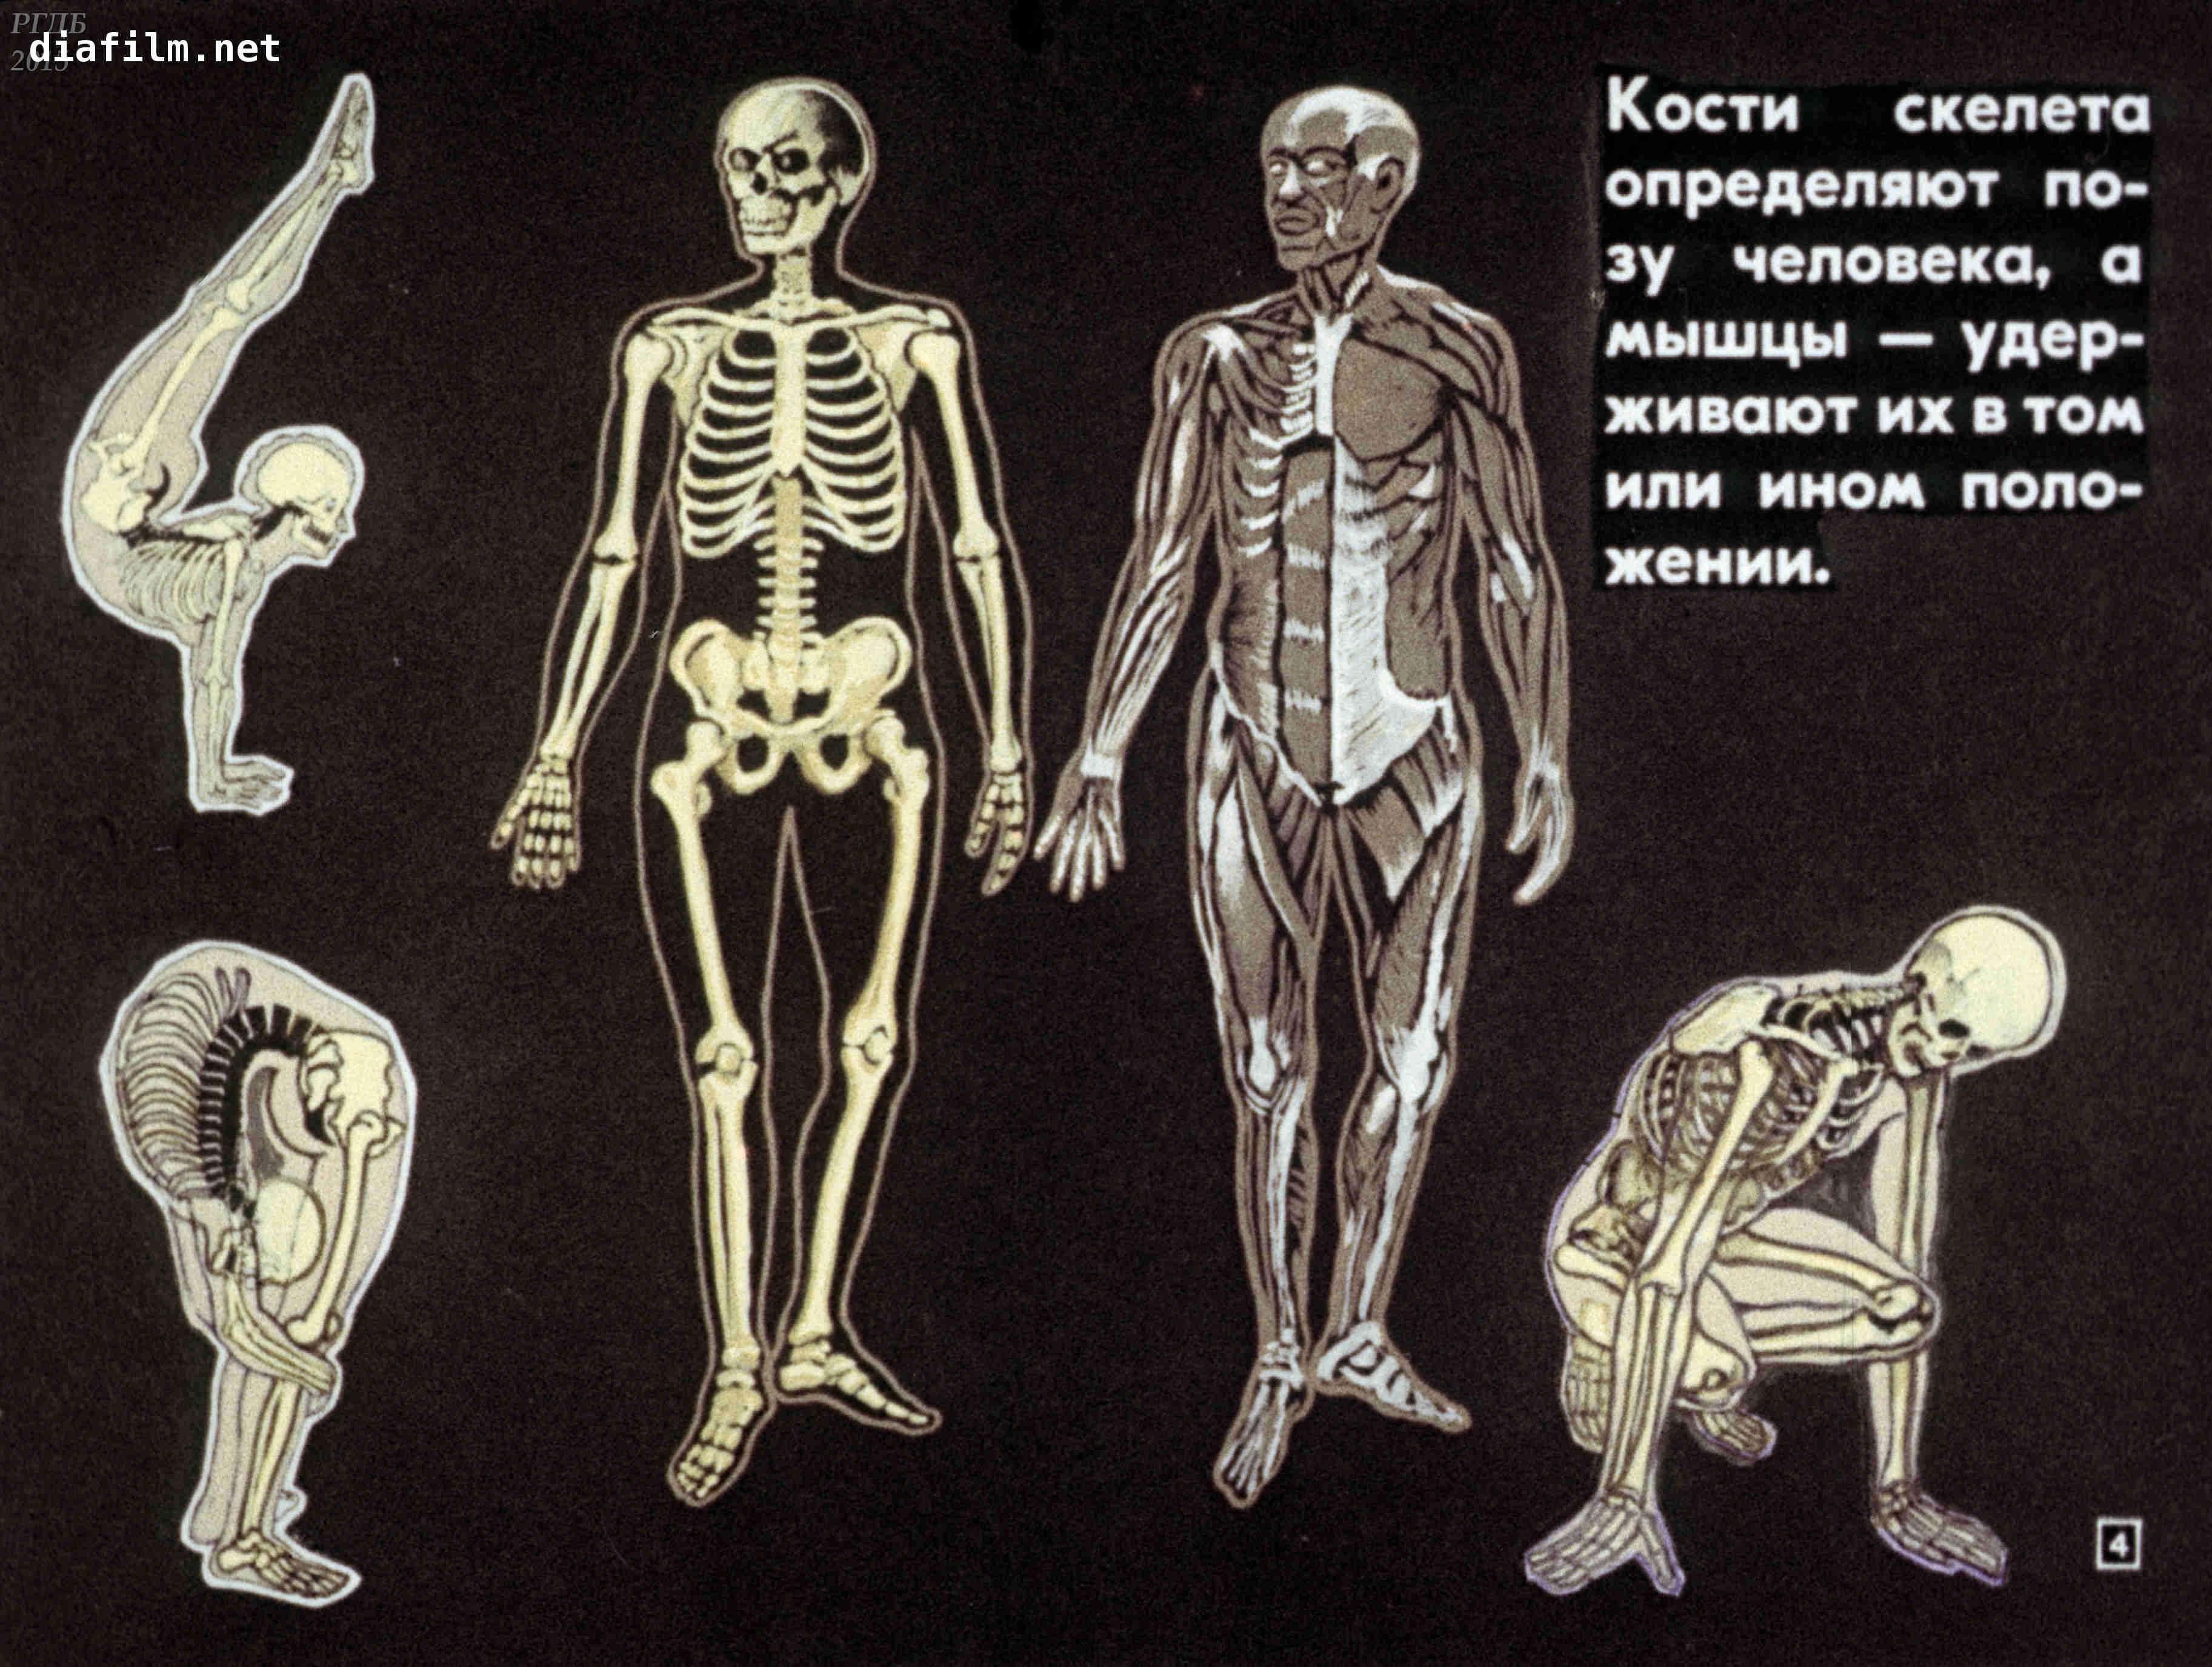 Кости скелета человека фото с описанием